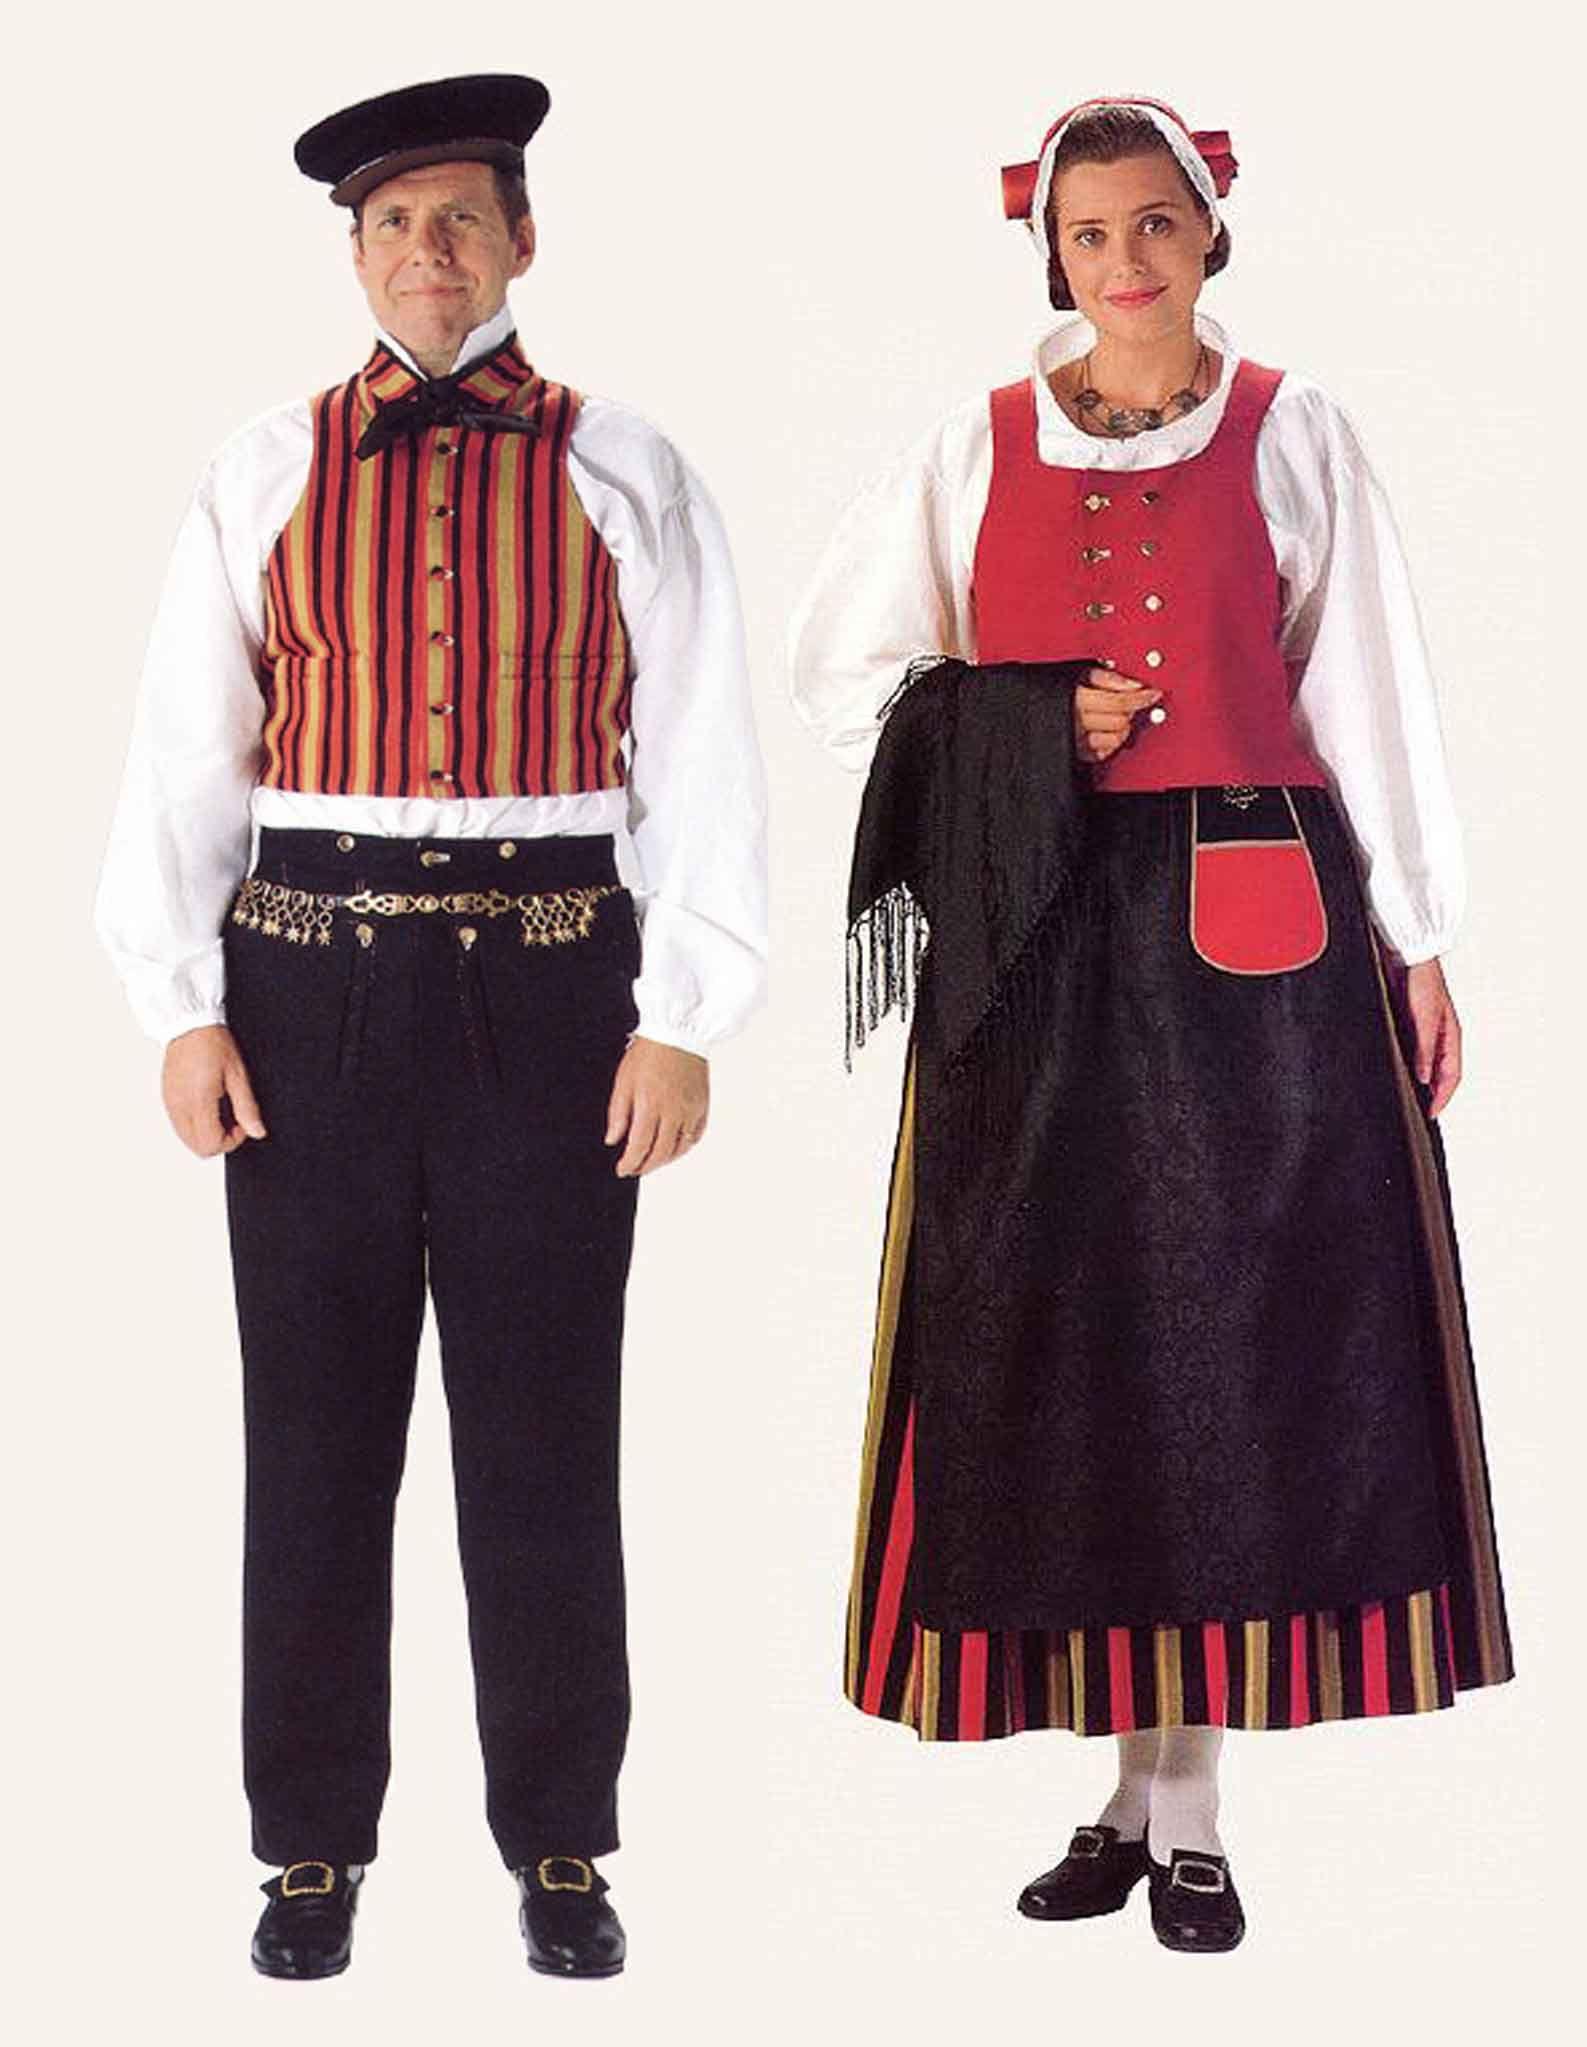 Costume - West Finnish And Karelian Costumes